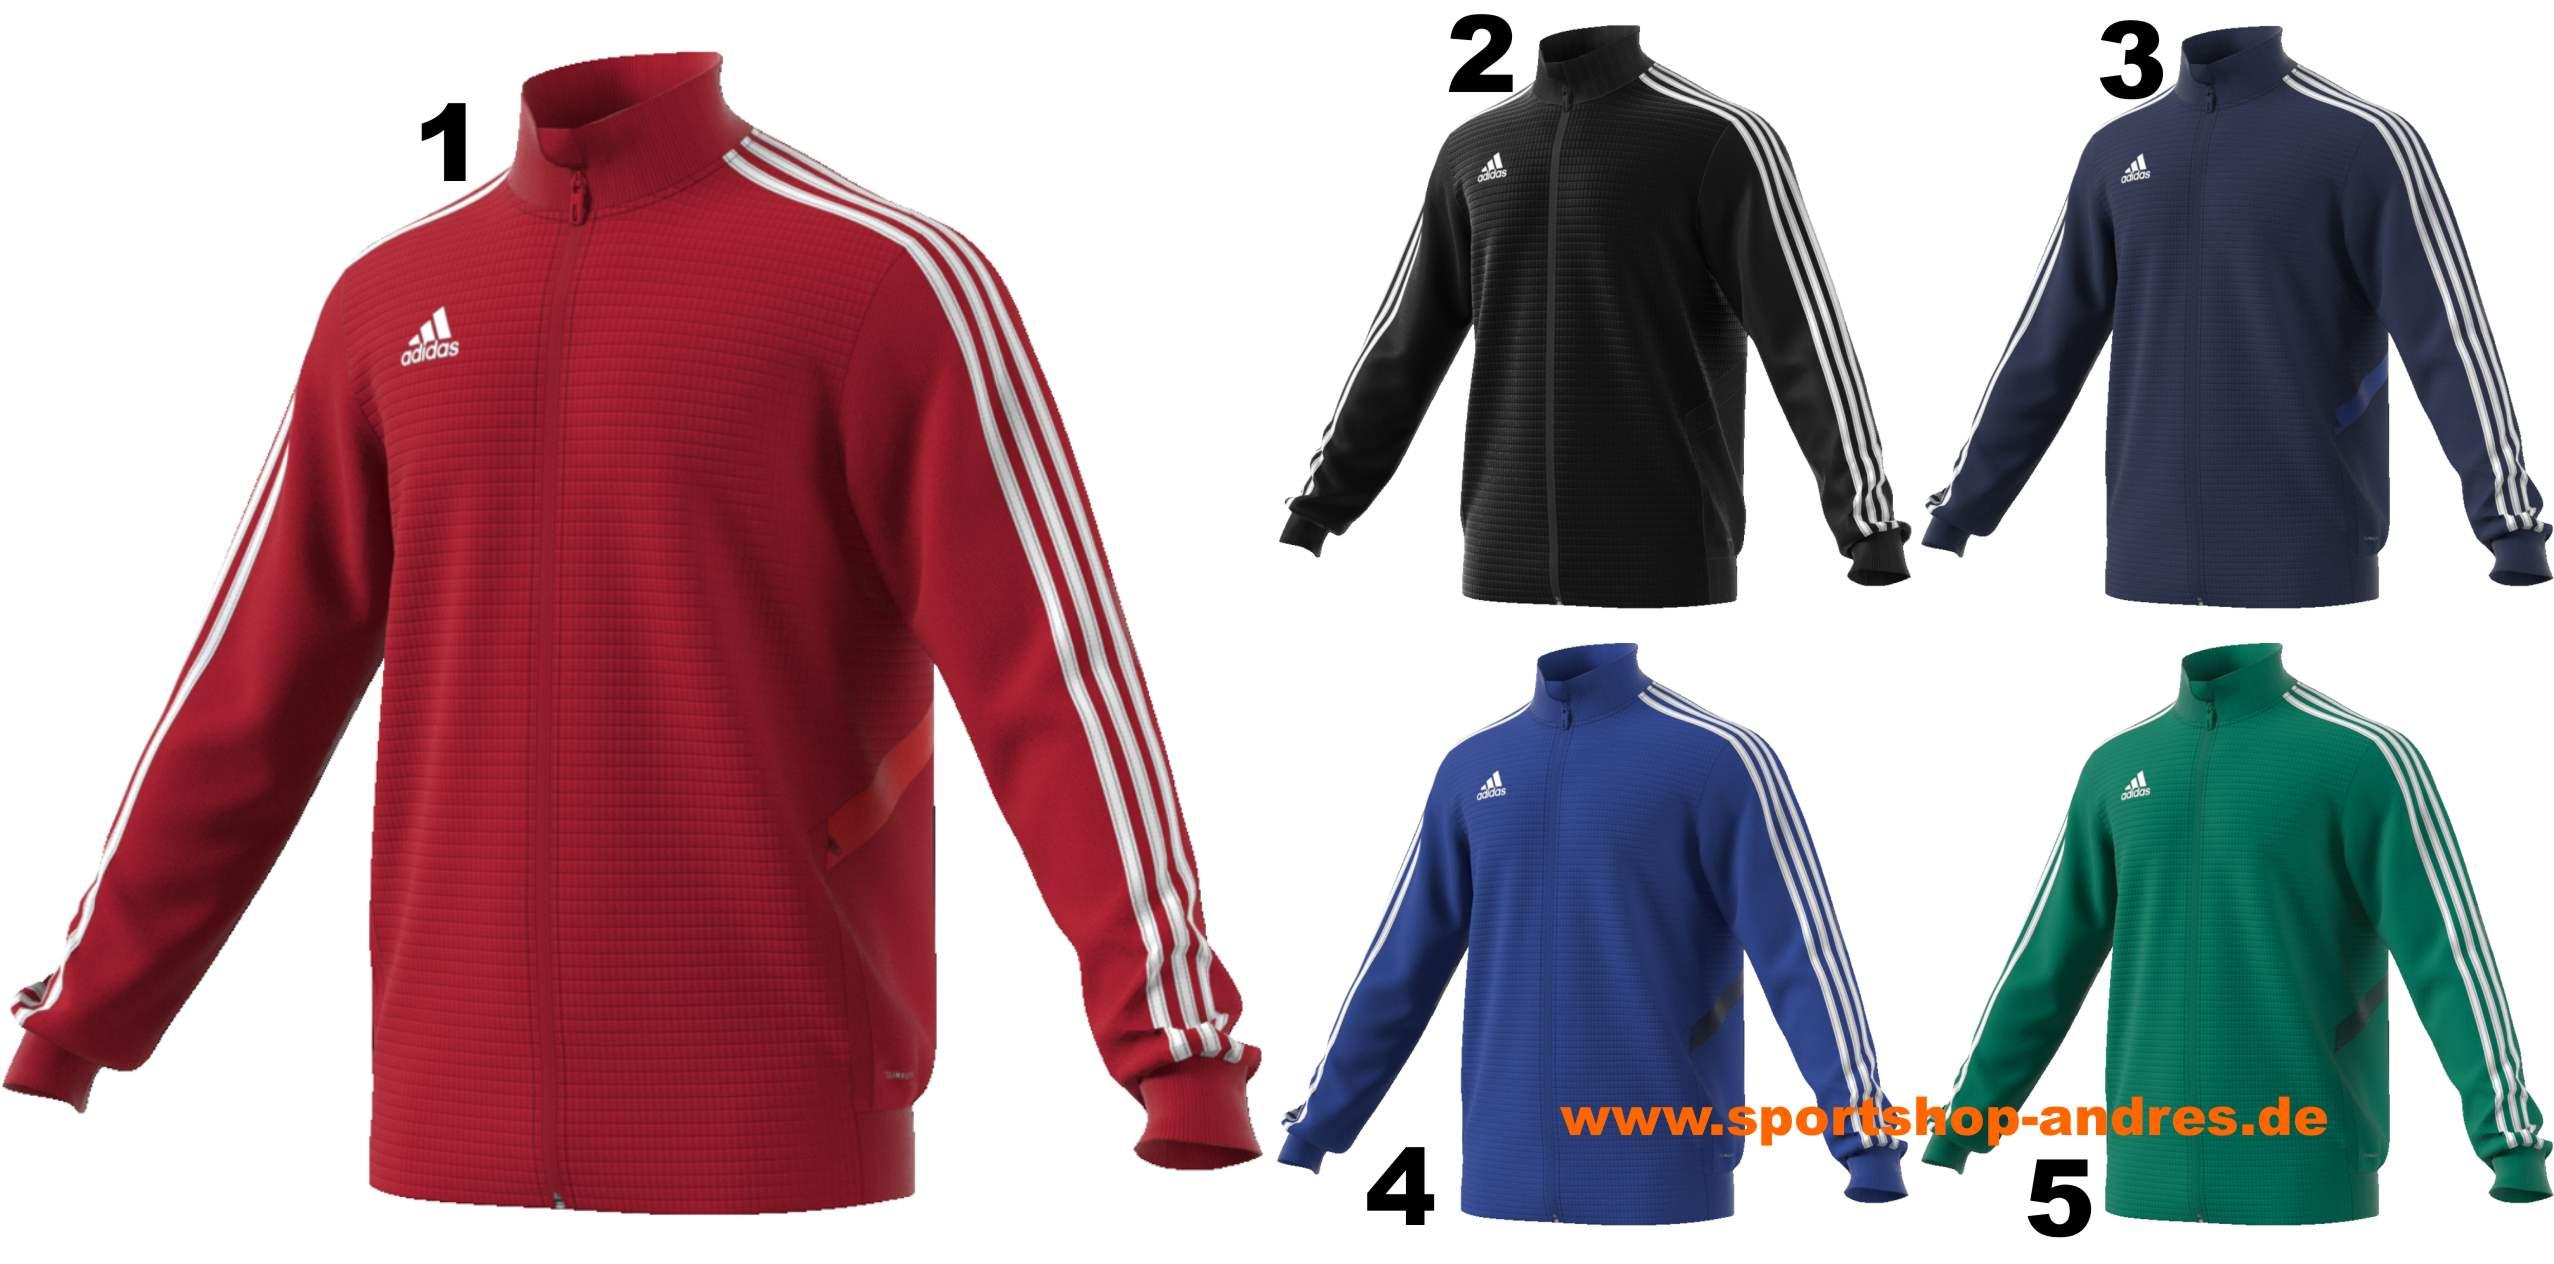 new concept c13d4 c2e03 Sportshop Andres - Adidas Tiro 19 Training Jacke Kinder ab ...